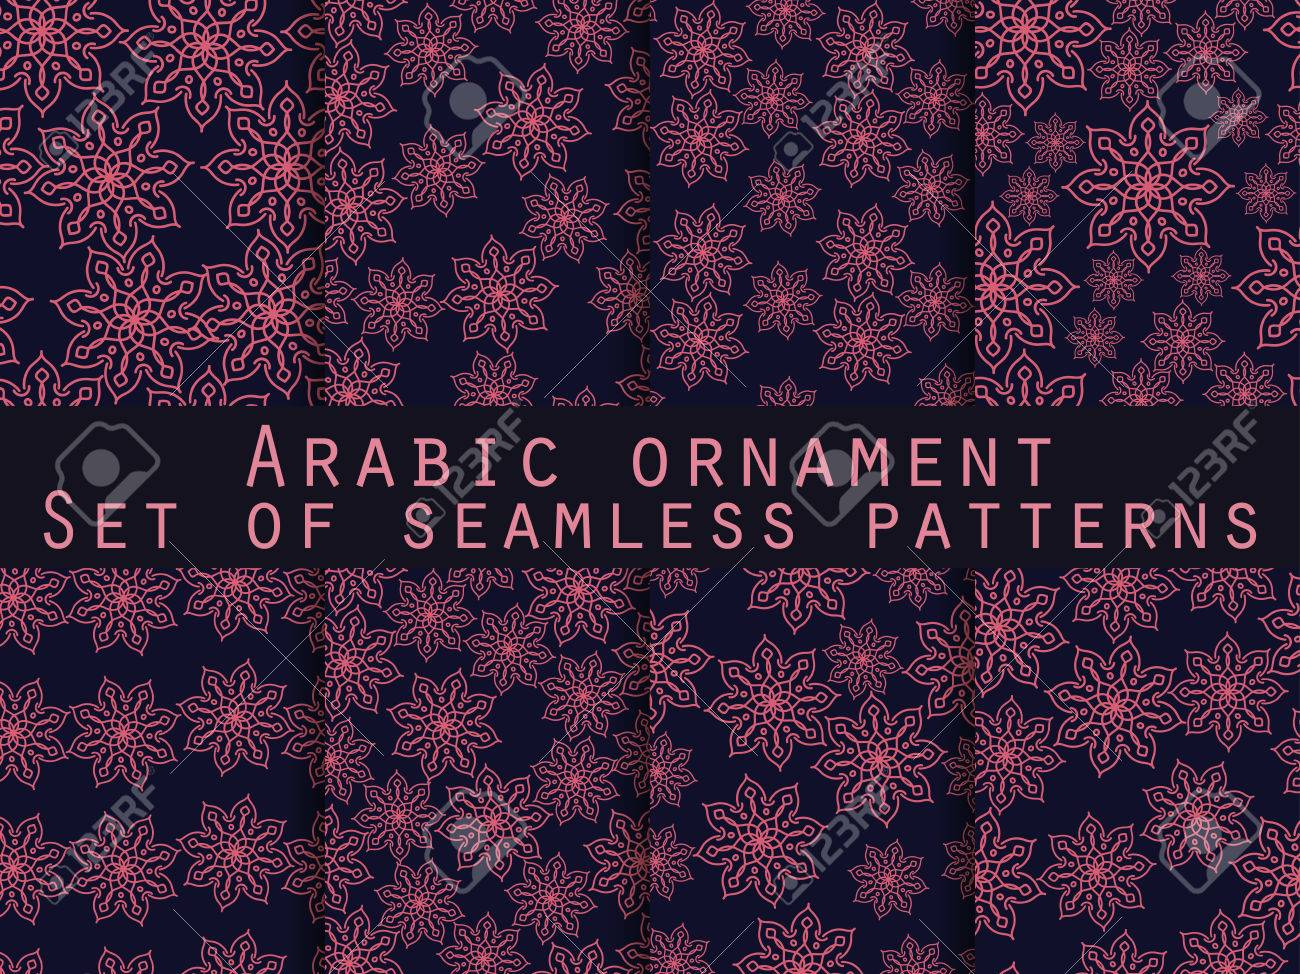 Simple Wallpaper Name Arabic - 53036559-arabic-pattern-islamic-ornament-set-of-seamless-patterns-for-wallpaper-bed-linen-tiles-fabrics-backg  Gallery_682886.jpg